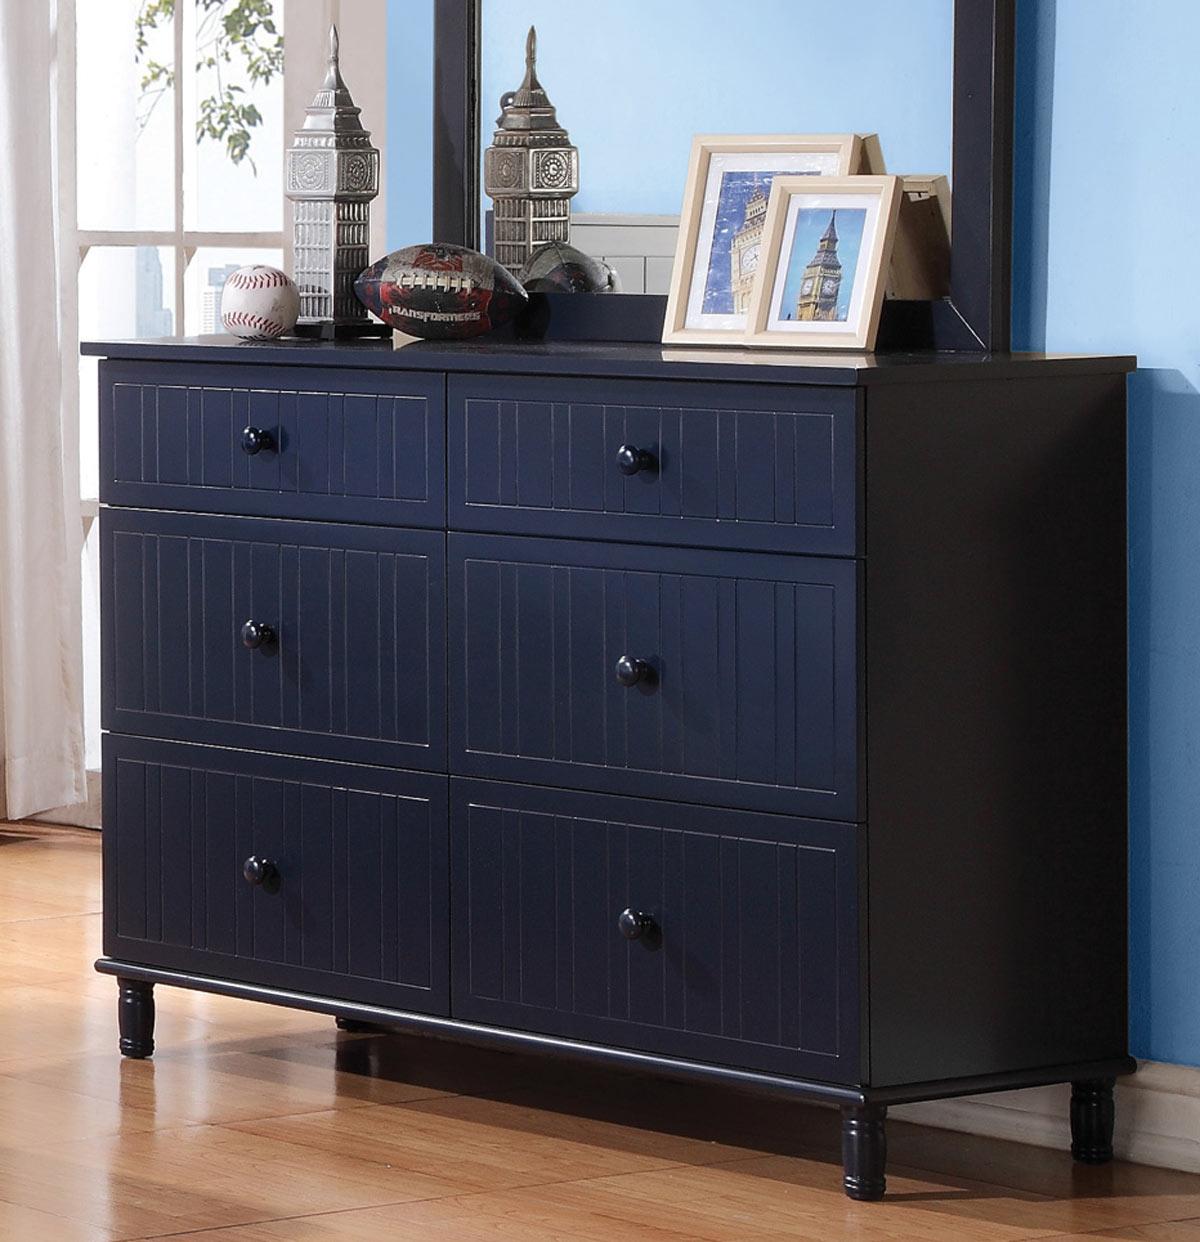 Coaster Zachary Dresser - Navy Blue